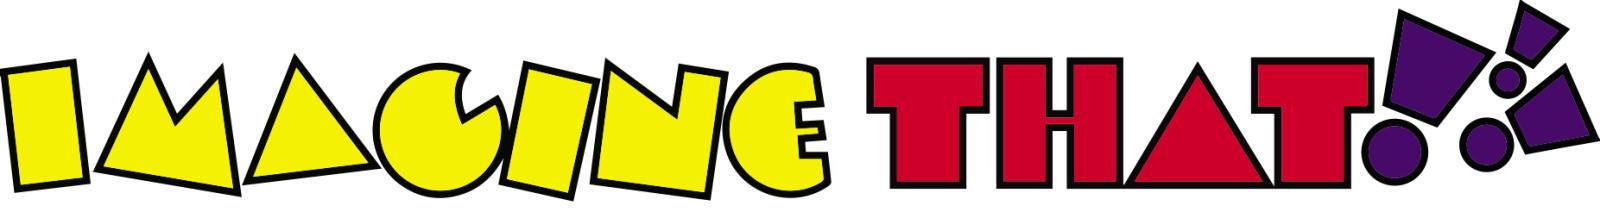 imagine that logo